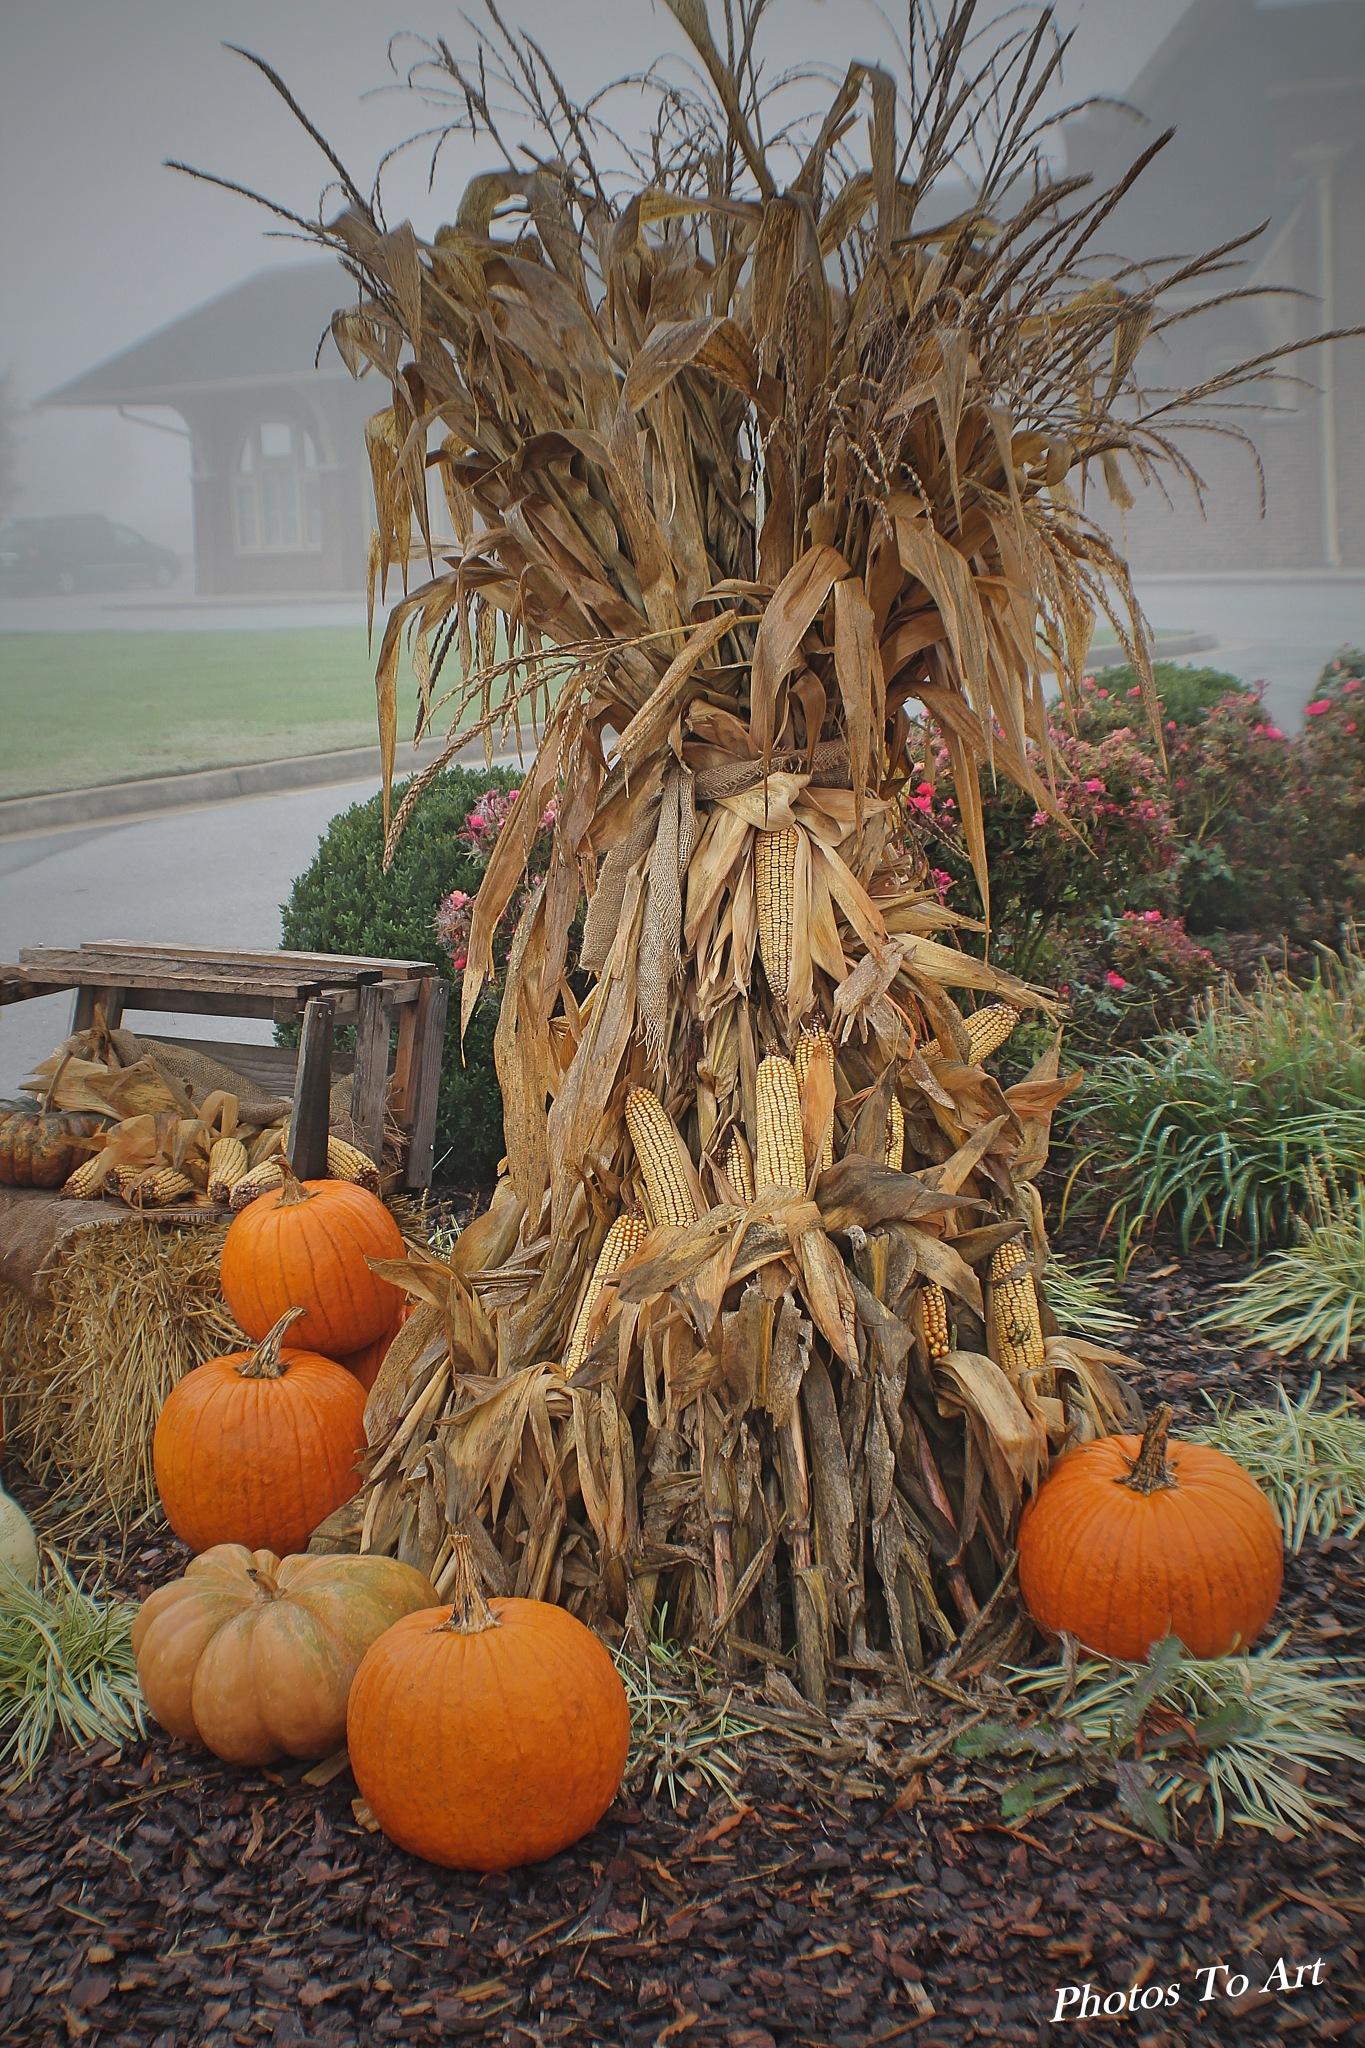 pumpkins and corn by Calvin Burdette